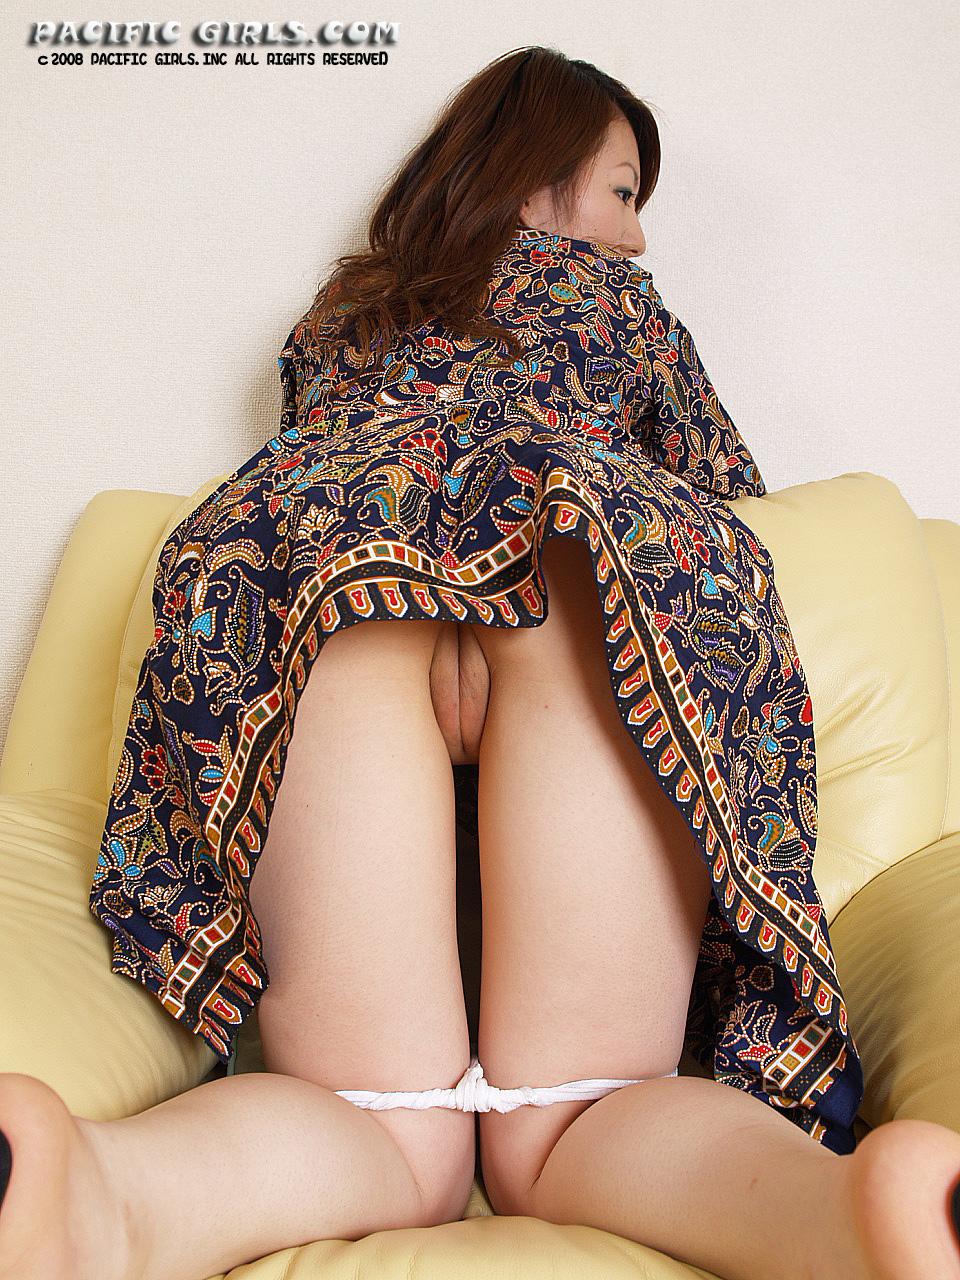 imagetwist.comnude pimpandhost image share.com 31(User Favorites Image teen girls nude $  